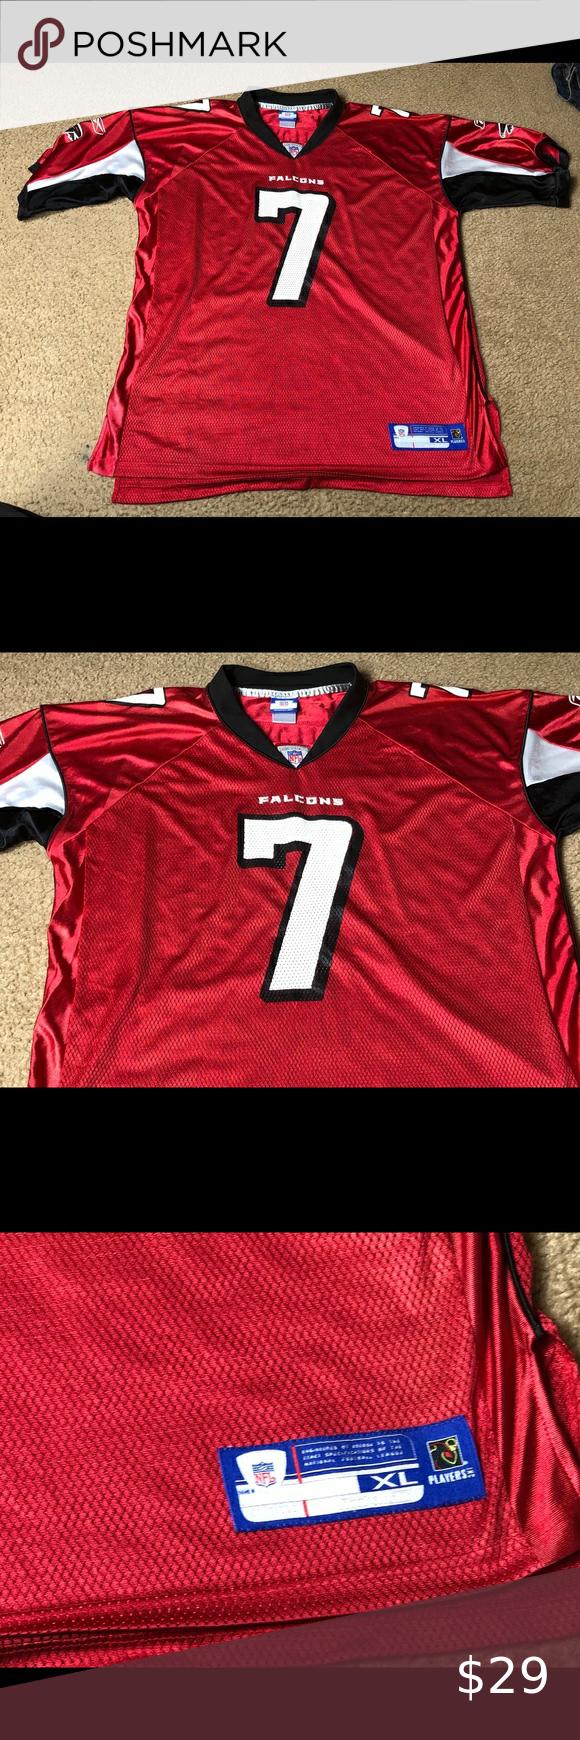 Mens Atlanta Falcons 7 Michael Vick Reebok Nf In 2020 Michael Vick Atlanta Falcons Reebok